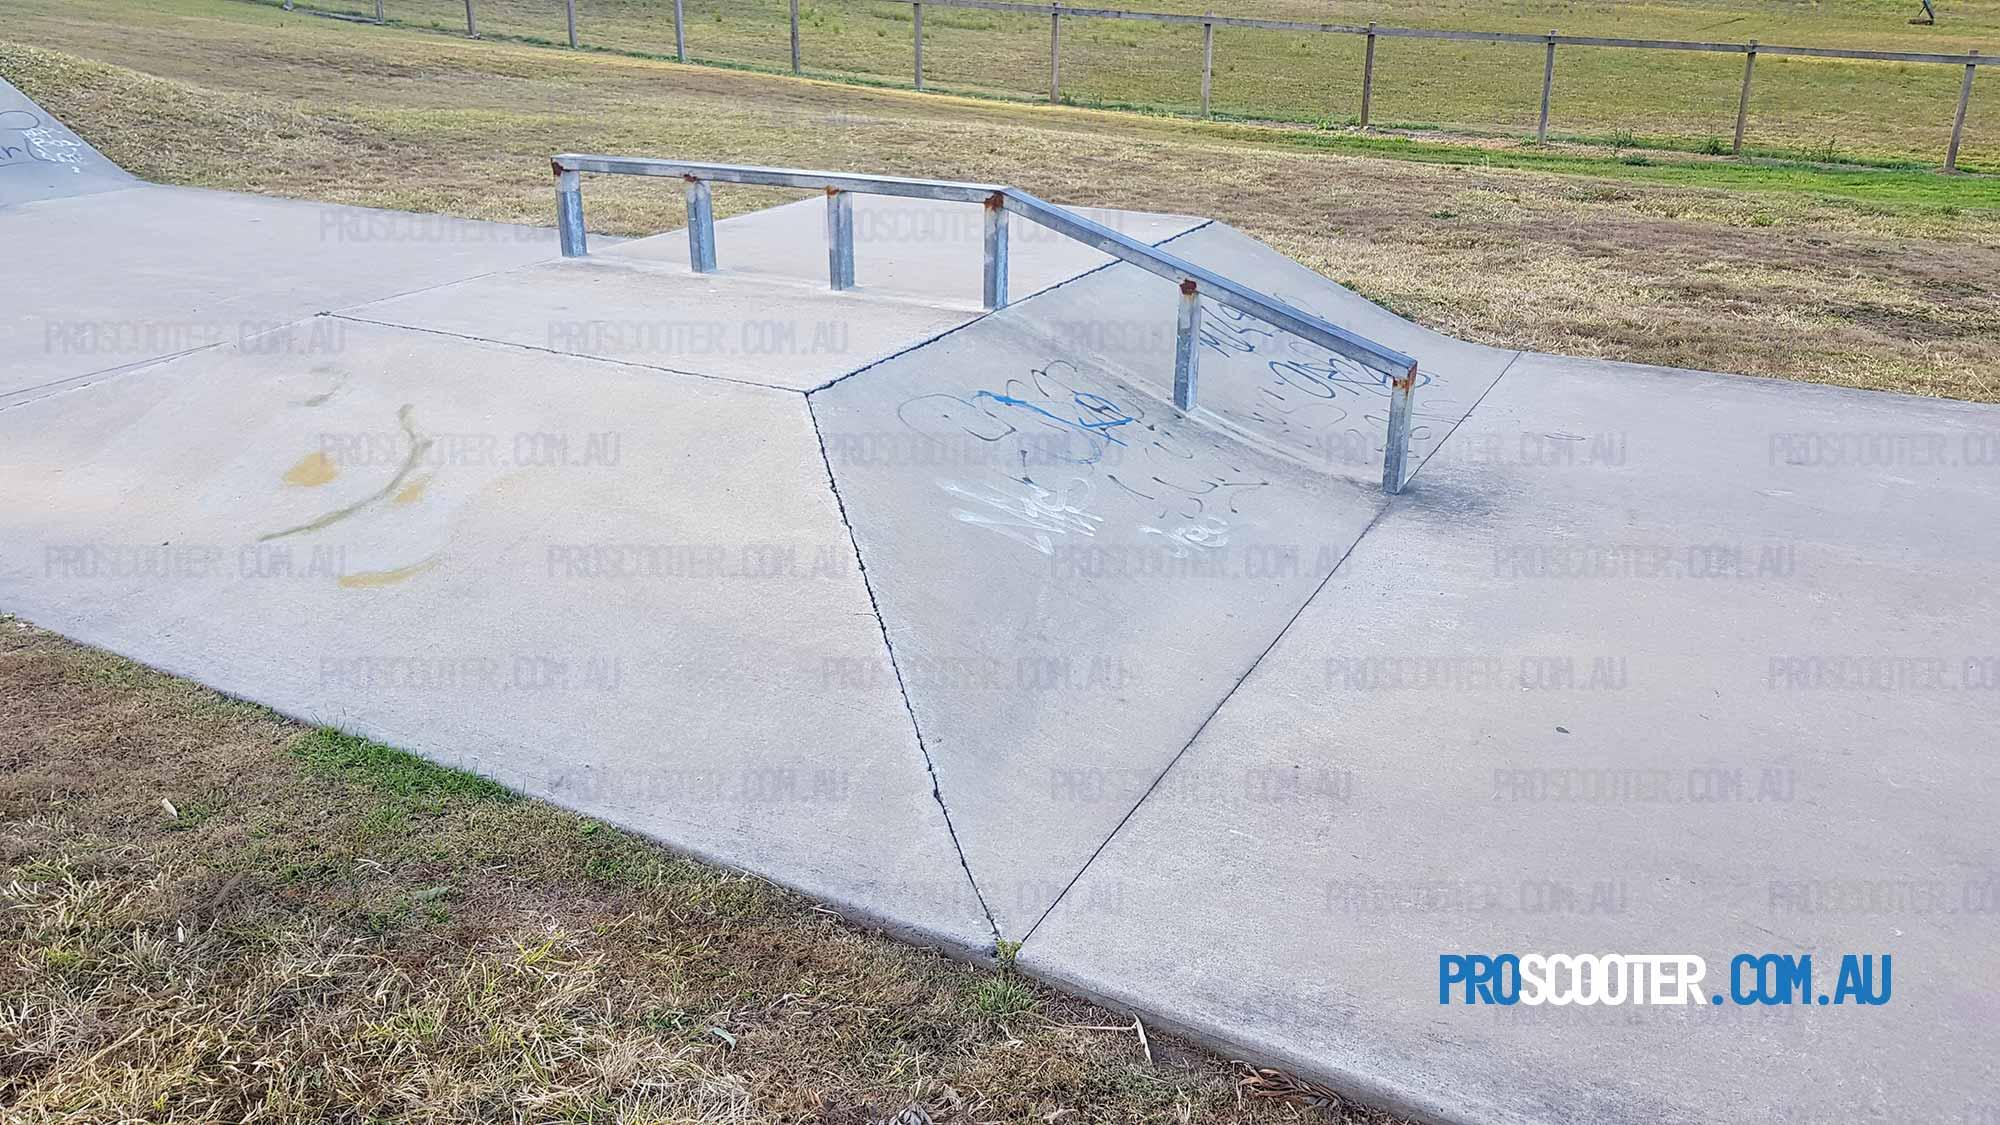 Tamborine Village Skatepark Funbox